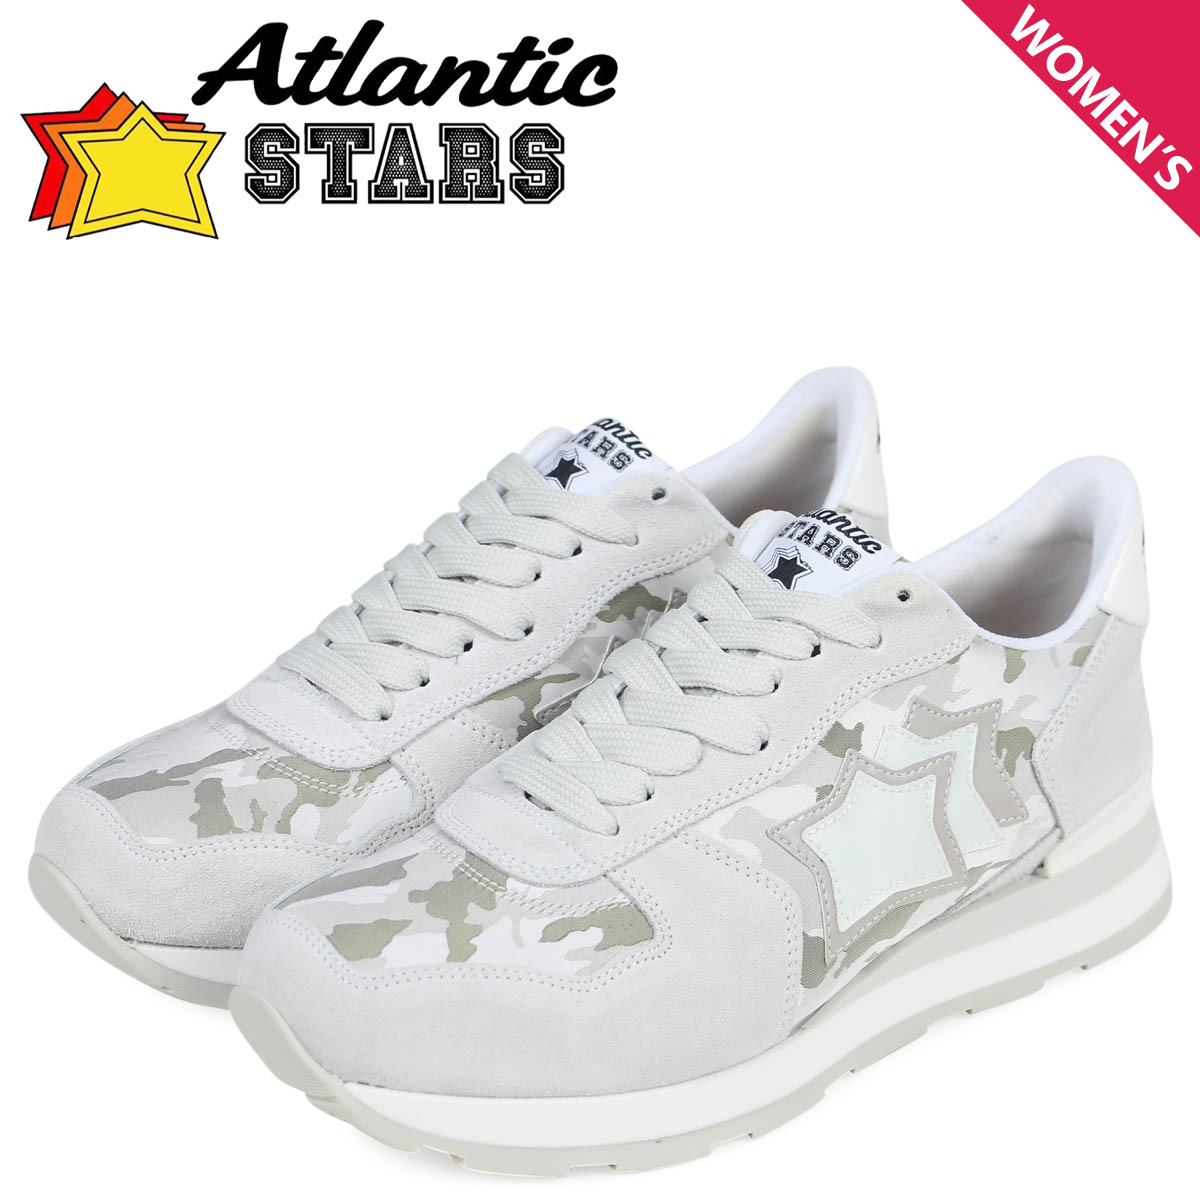 Atlantic STARS アトランティックスターズ レディース スニーカー ベガ VEGA BMB-86B ホワイト 白